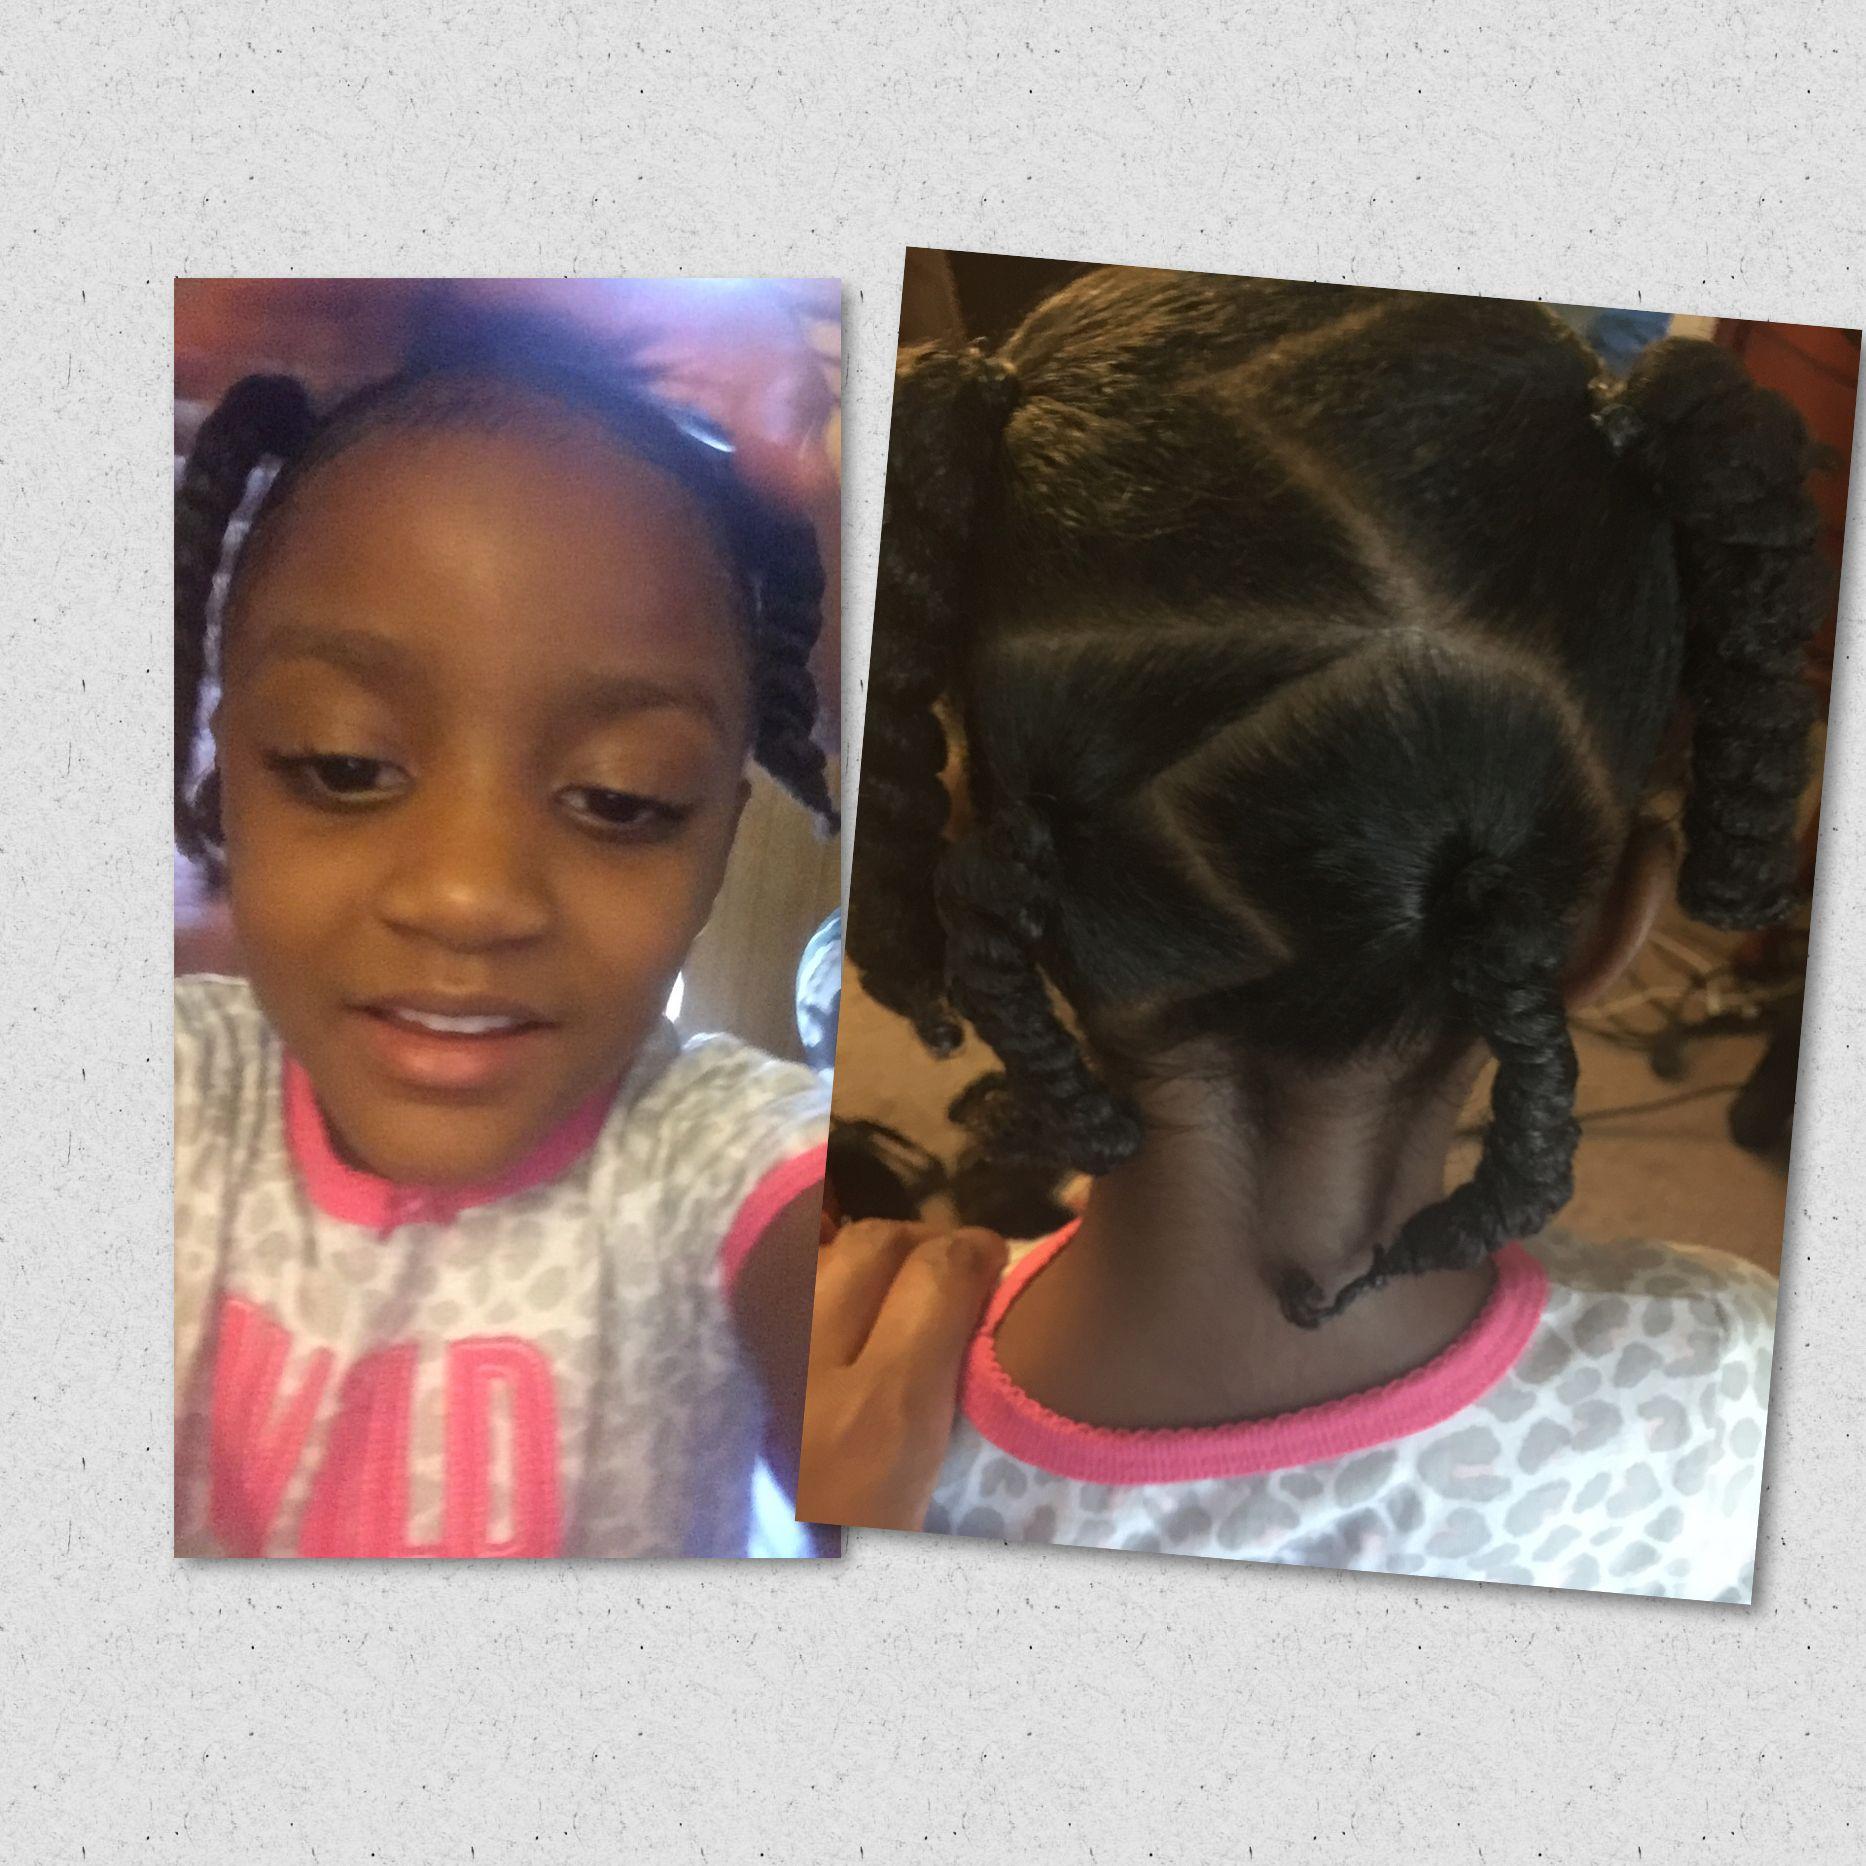 ponytail #ponytails #african-american #black #toddler #hair #curly